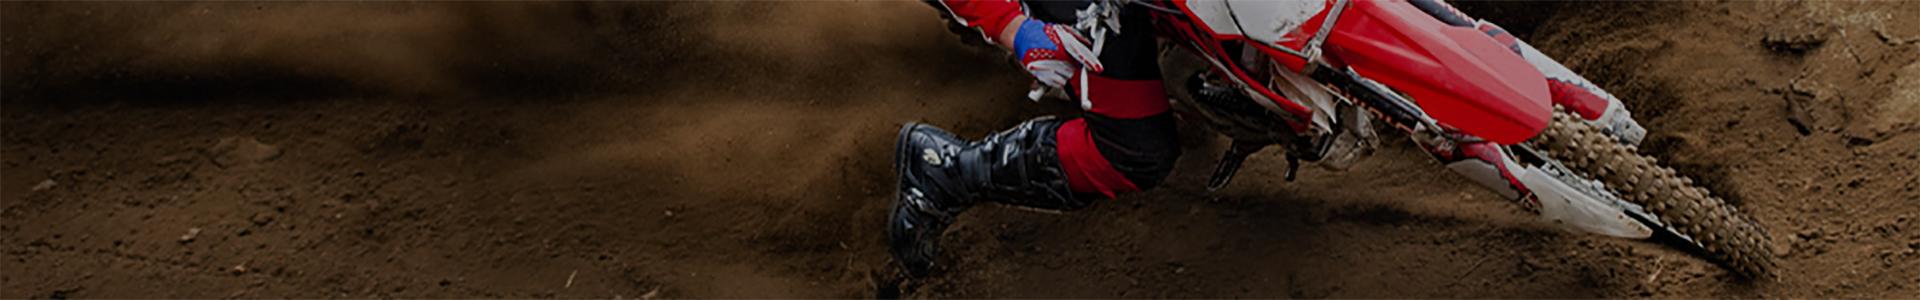 Image catégorie Motos et motocross